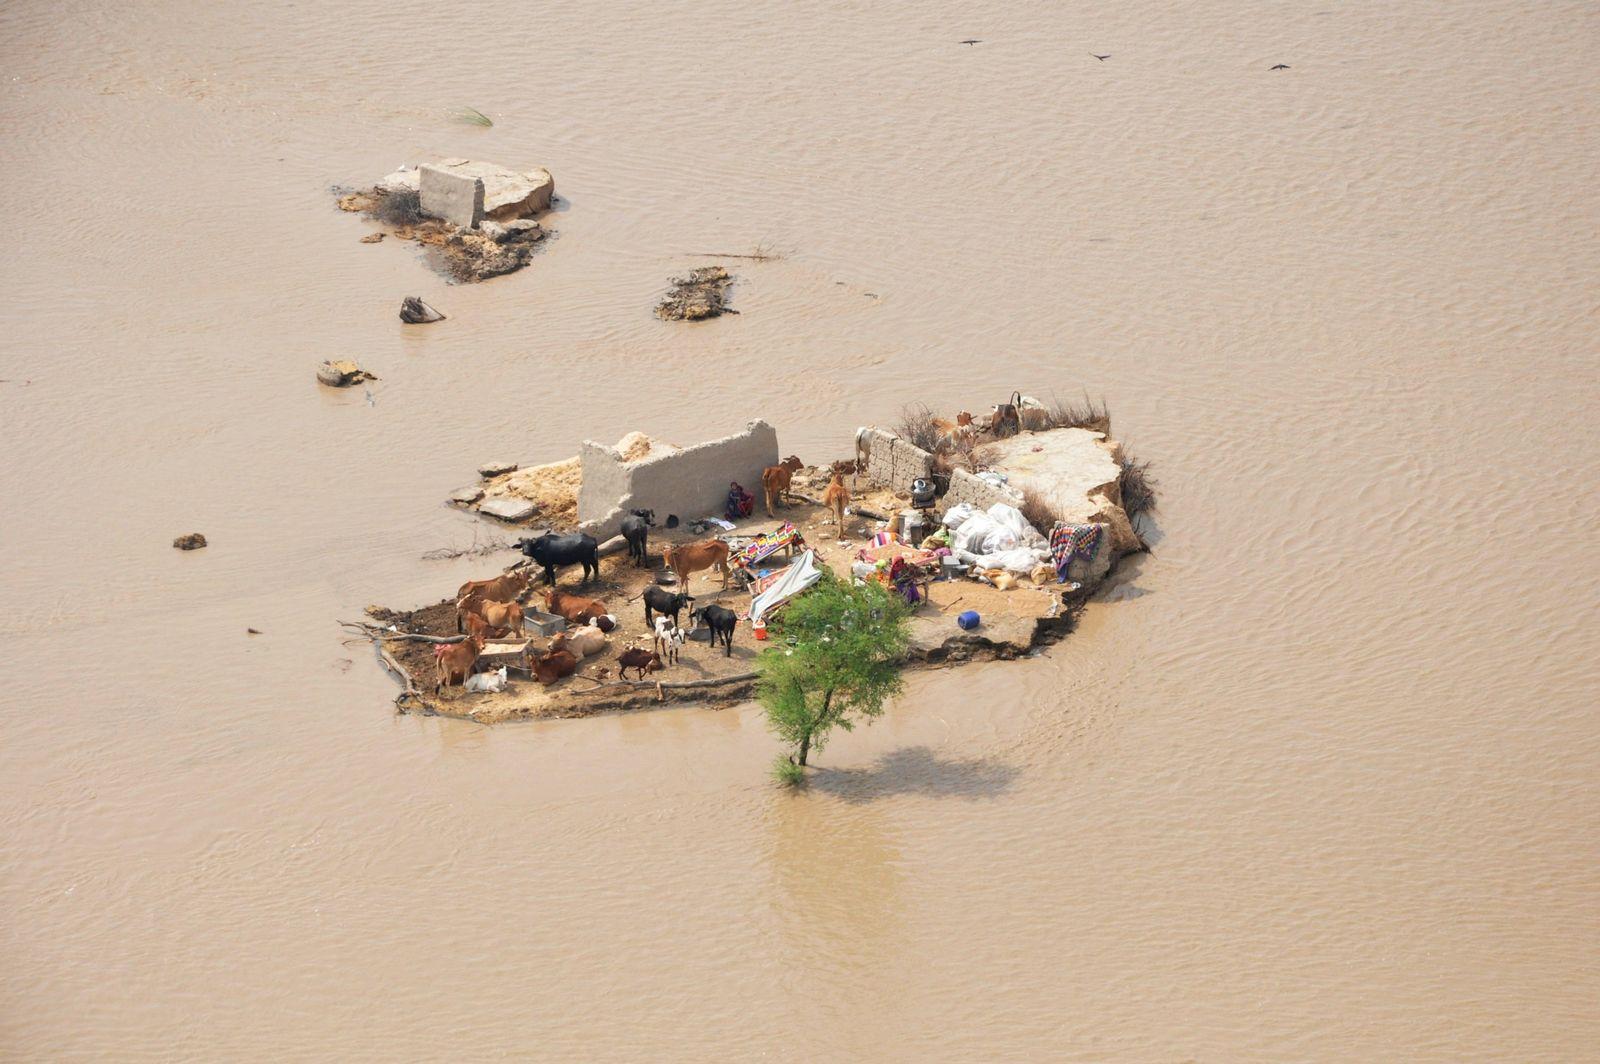 PAKISTAN-FLOODS/